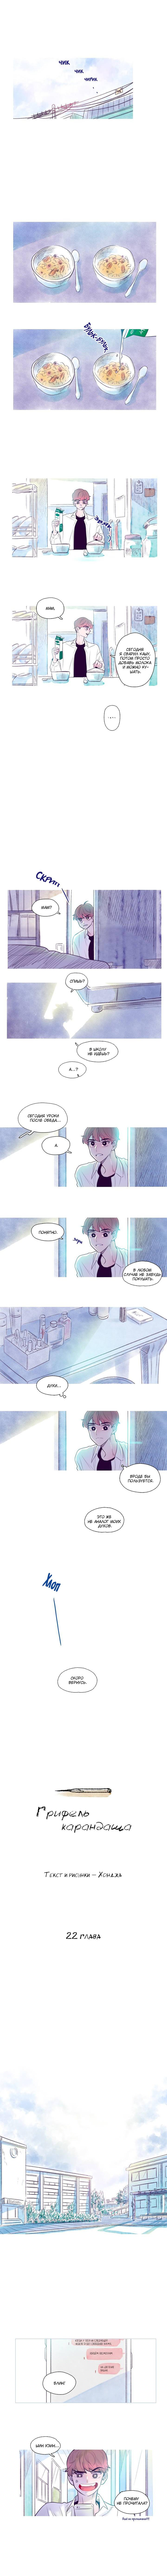 https://r2.ninemanga.com/comics/pic4/35/34723/1335321/1556550497985.jpg Page 2